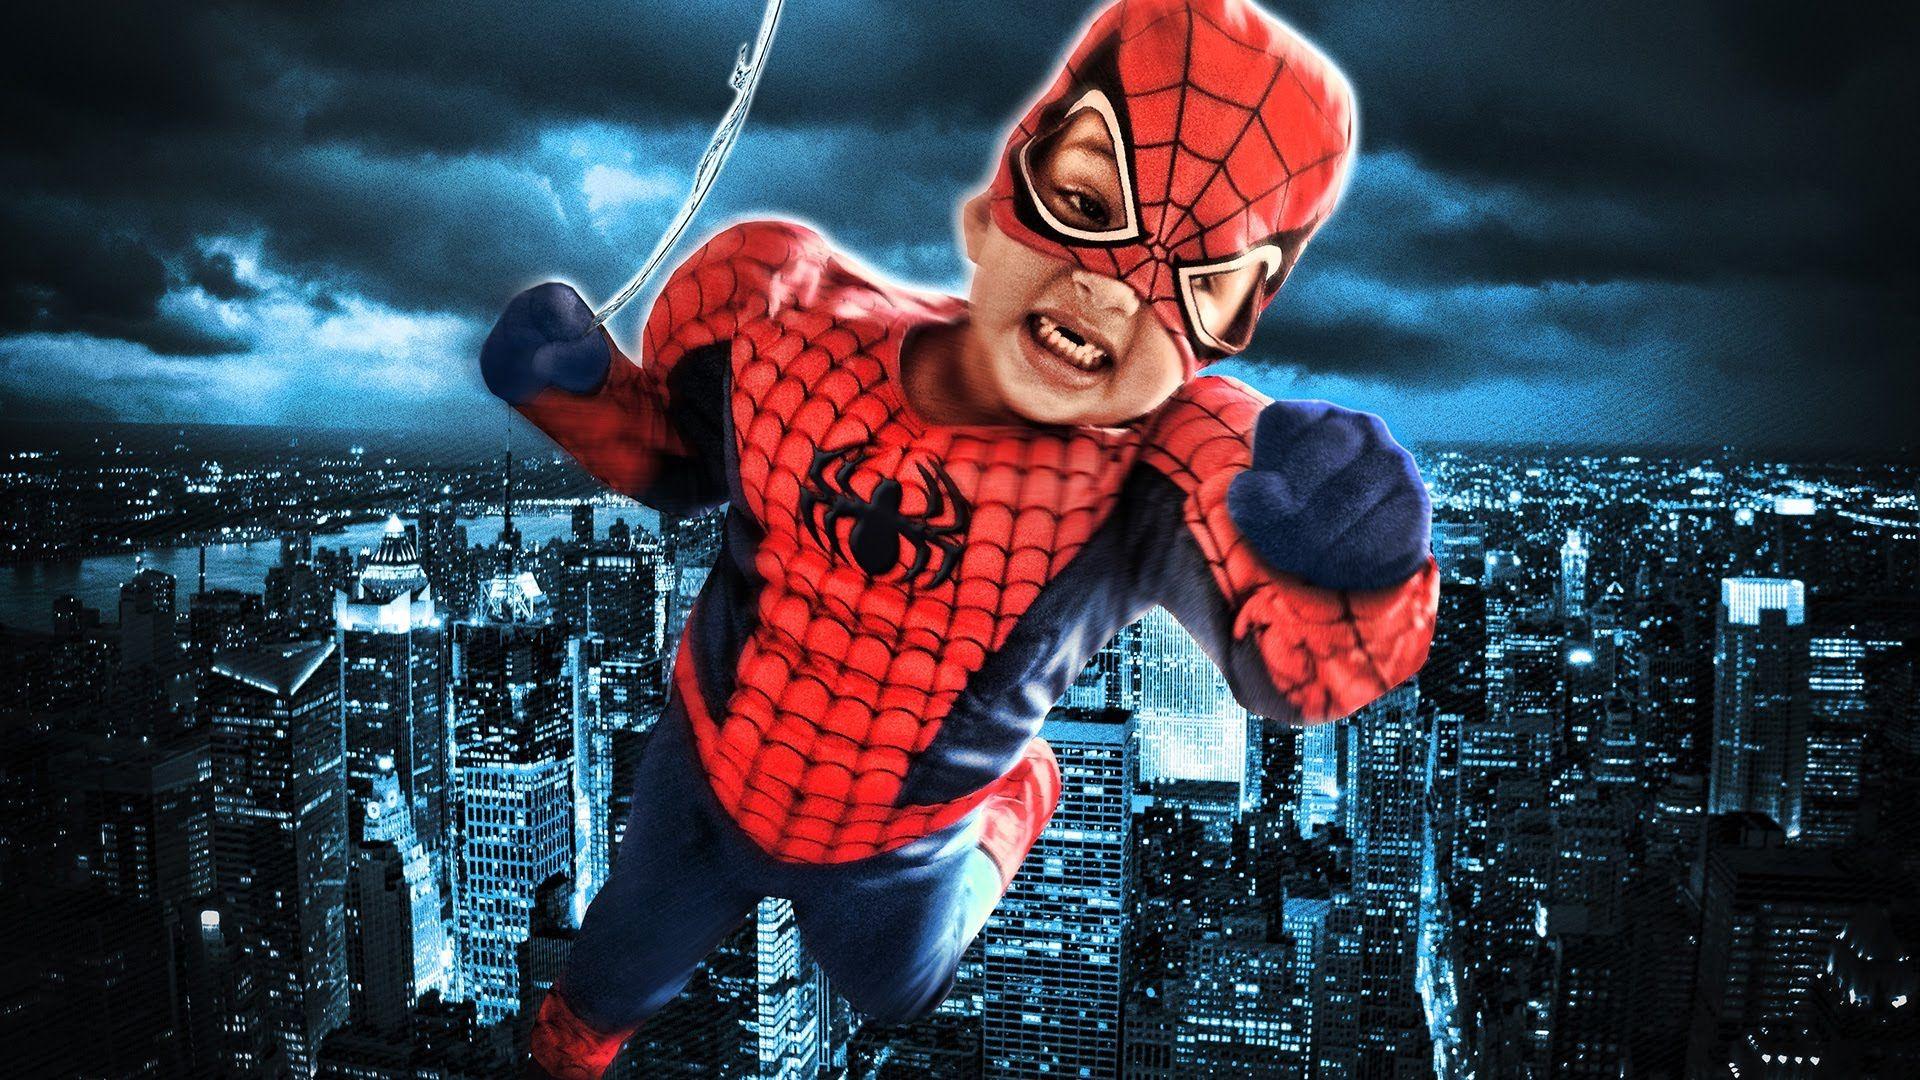 Create a spiderman photo in photoshop photo editing tutorials create a spiderman photo in photoshop photoshop tutorialphoto editingspidermanspider man baditri Images